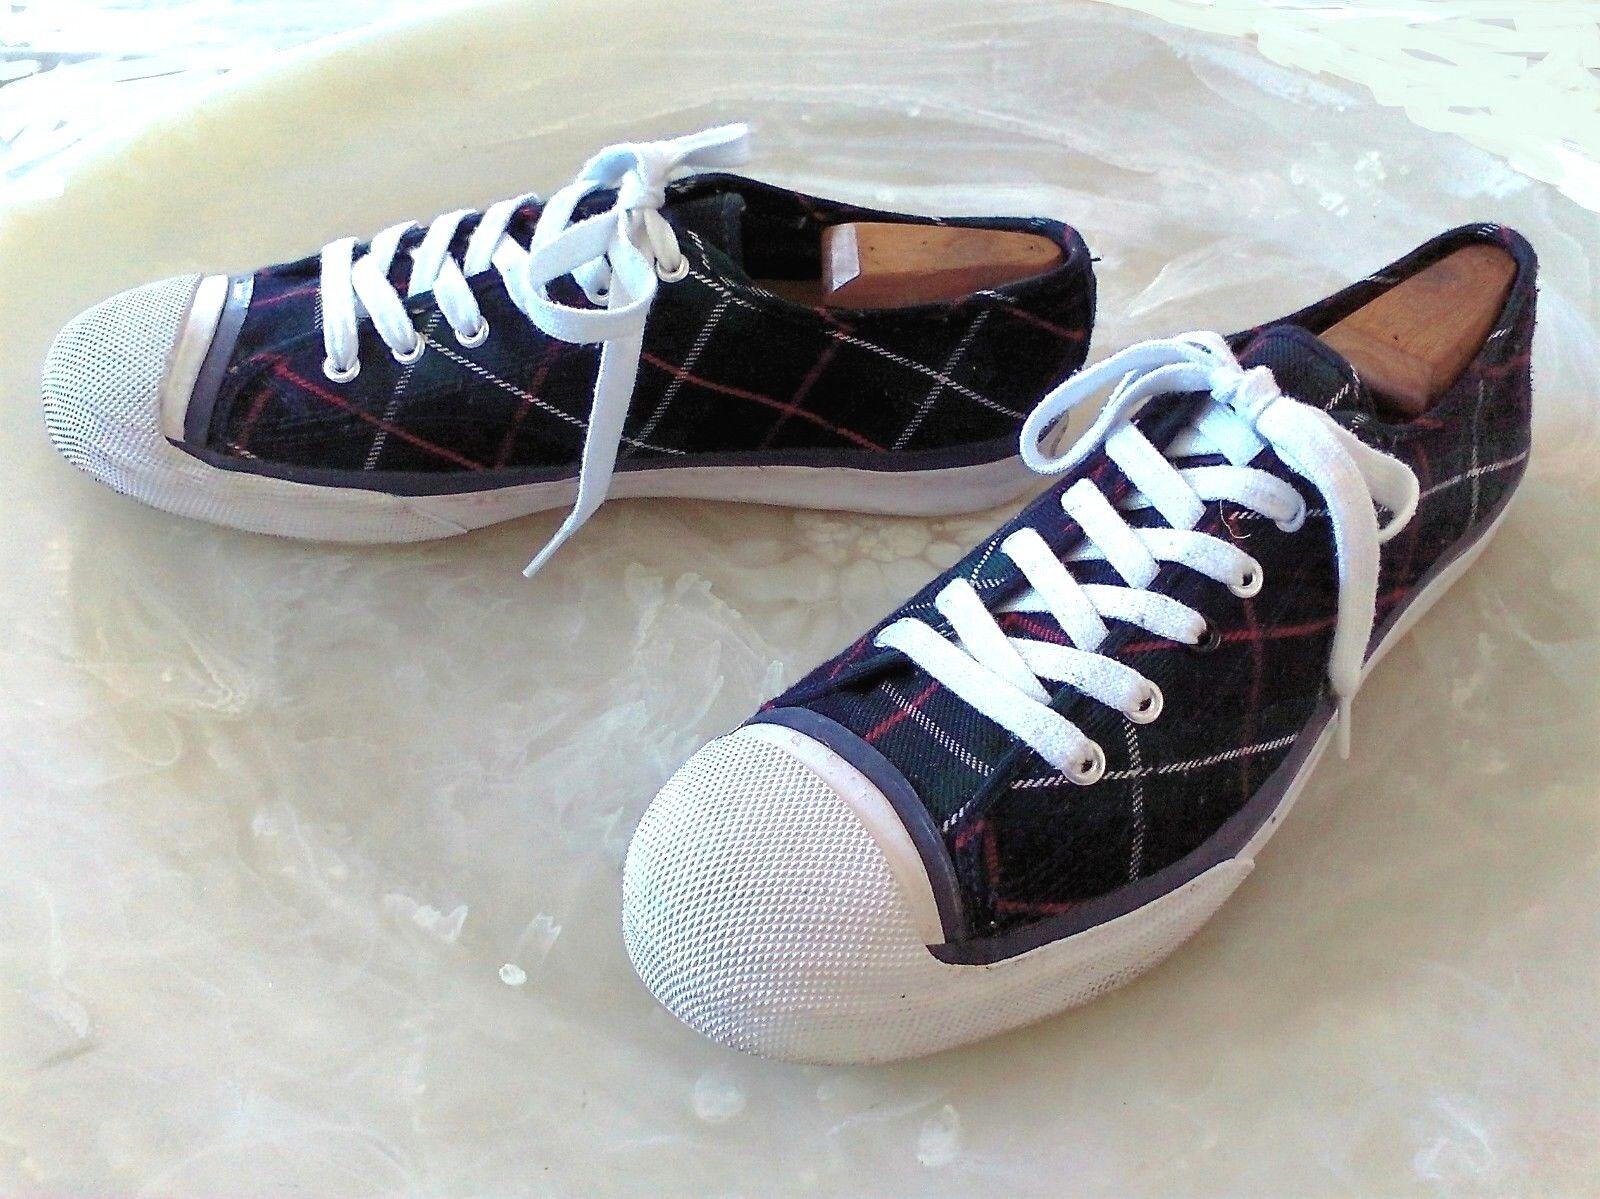 4899fb7d0a5c4 PAUL SMITH Inari Men s 9.5 M Navy bluee Green Tartan Low Top Sneakers